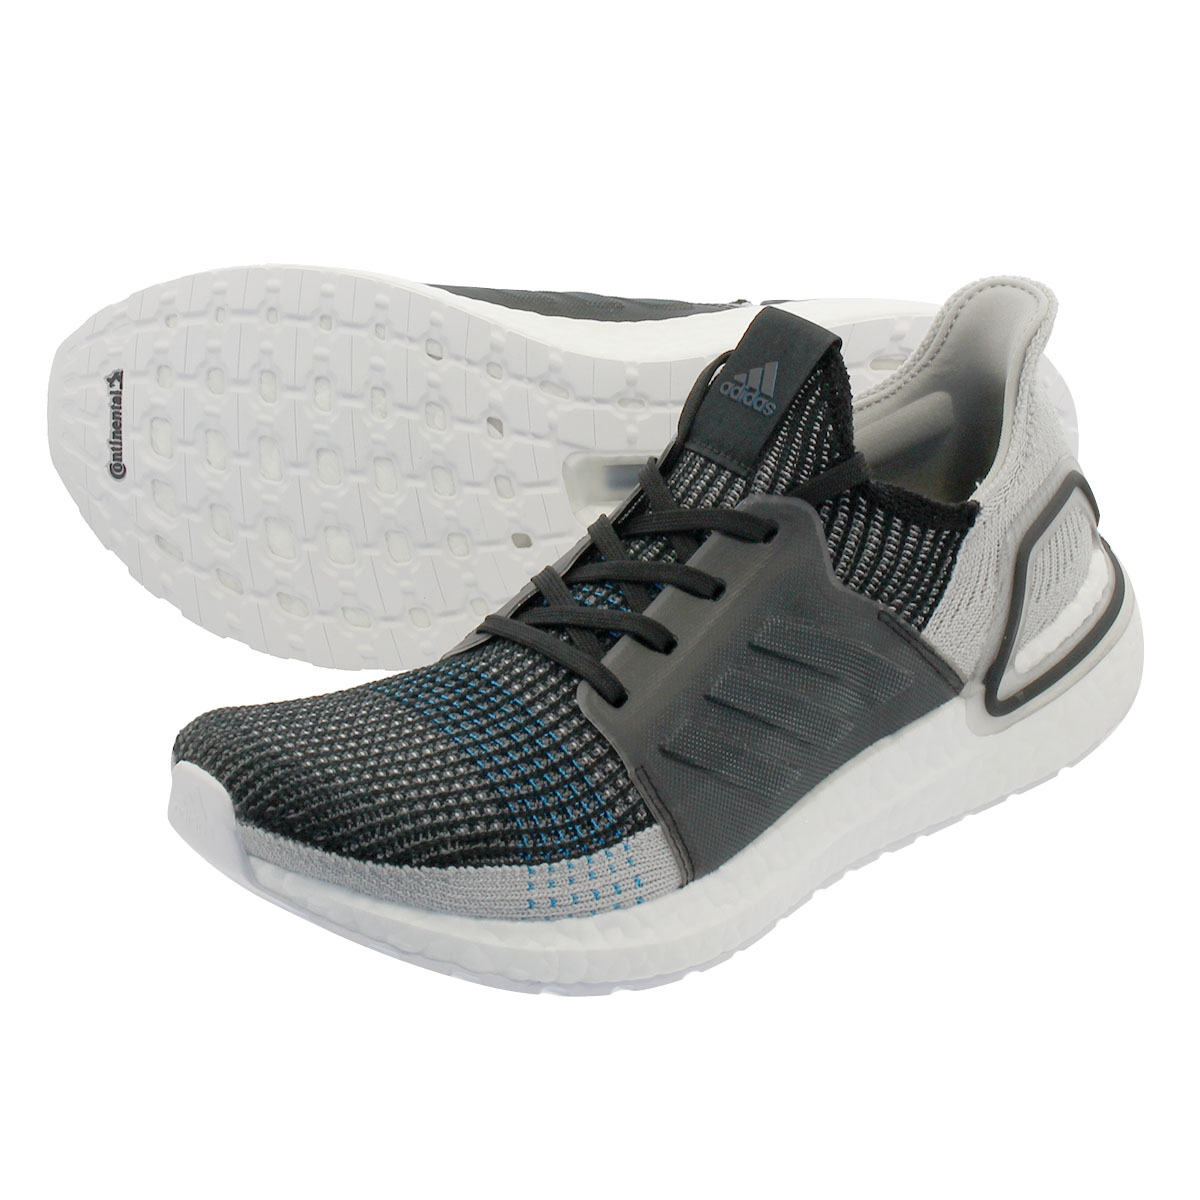 adidas ULTRA BOOST 19 アディダス ウルトラ ブースト 19 CORE BLACK/GREY SIX/SHOCK CYAN f35242